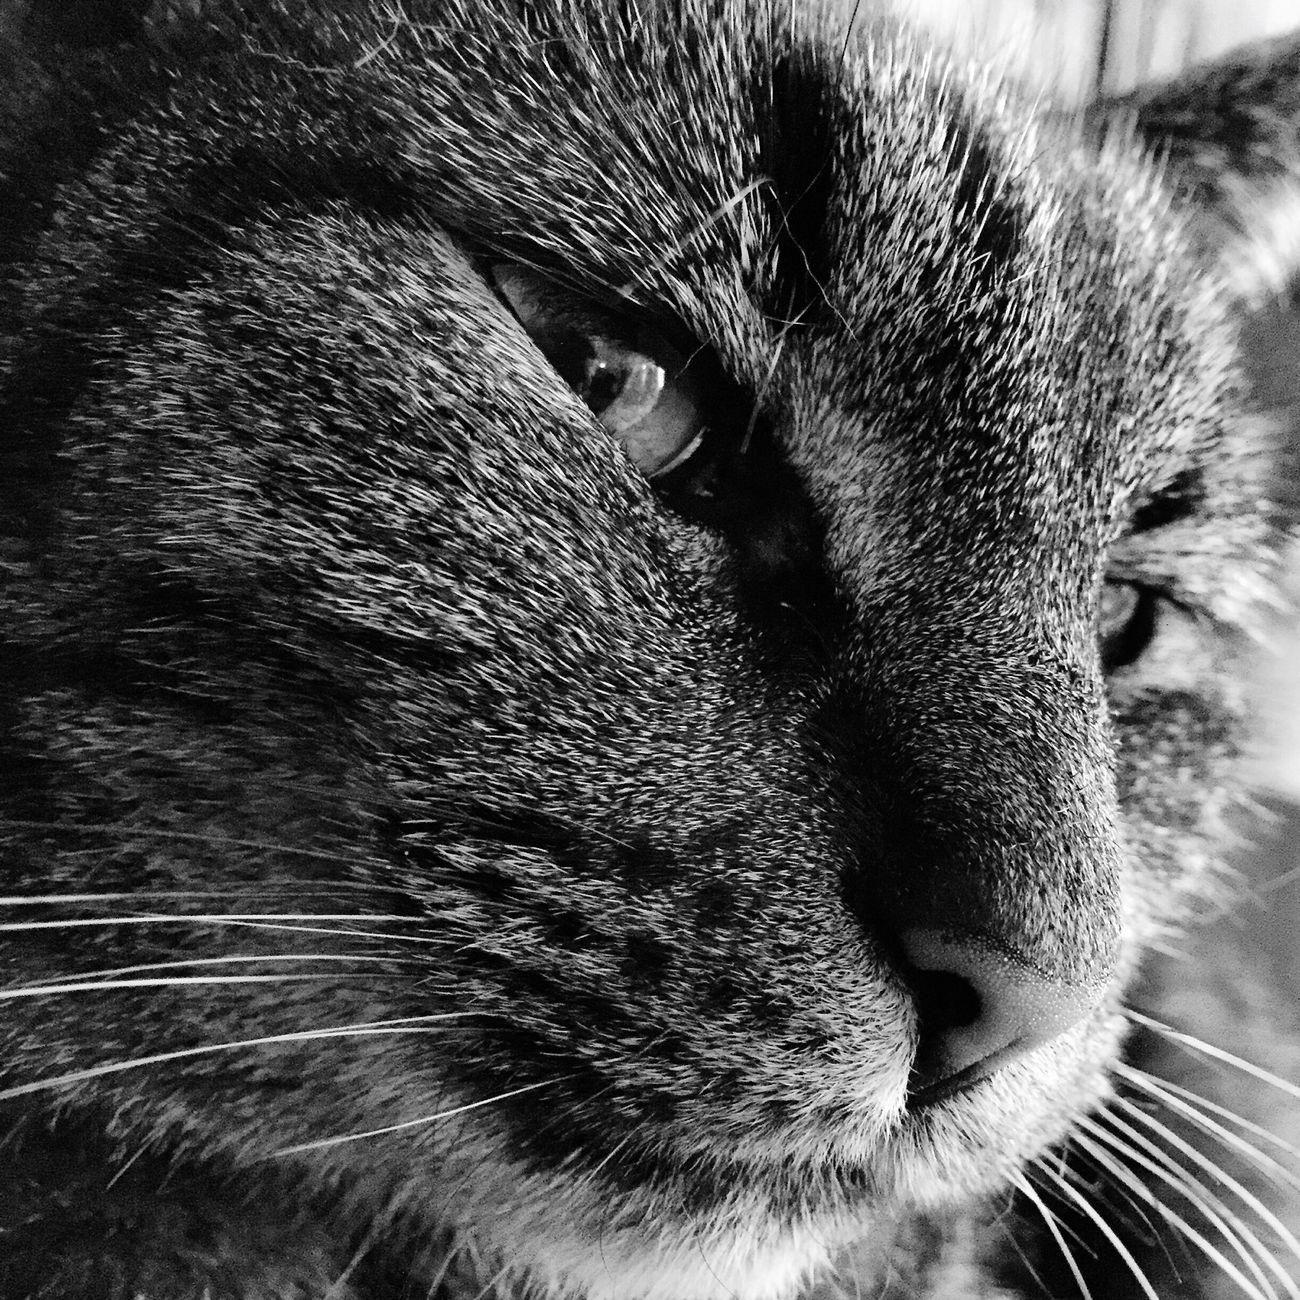 Cat EyeEmBestPics EyeEm Gallery Eye4delight The Week Of Eyeem Bw_collection EyeEm Best Edits Animal Photography Animal_collection Cats Of EyeEm